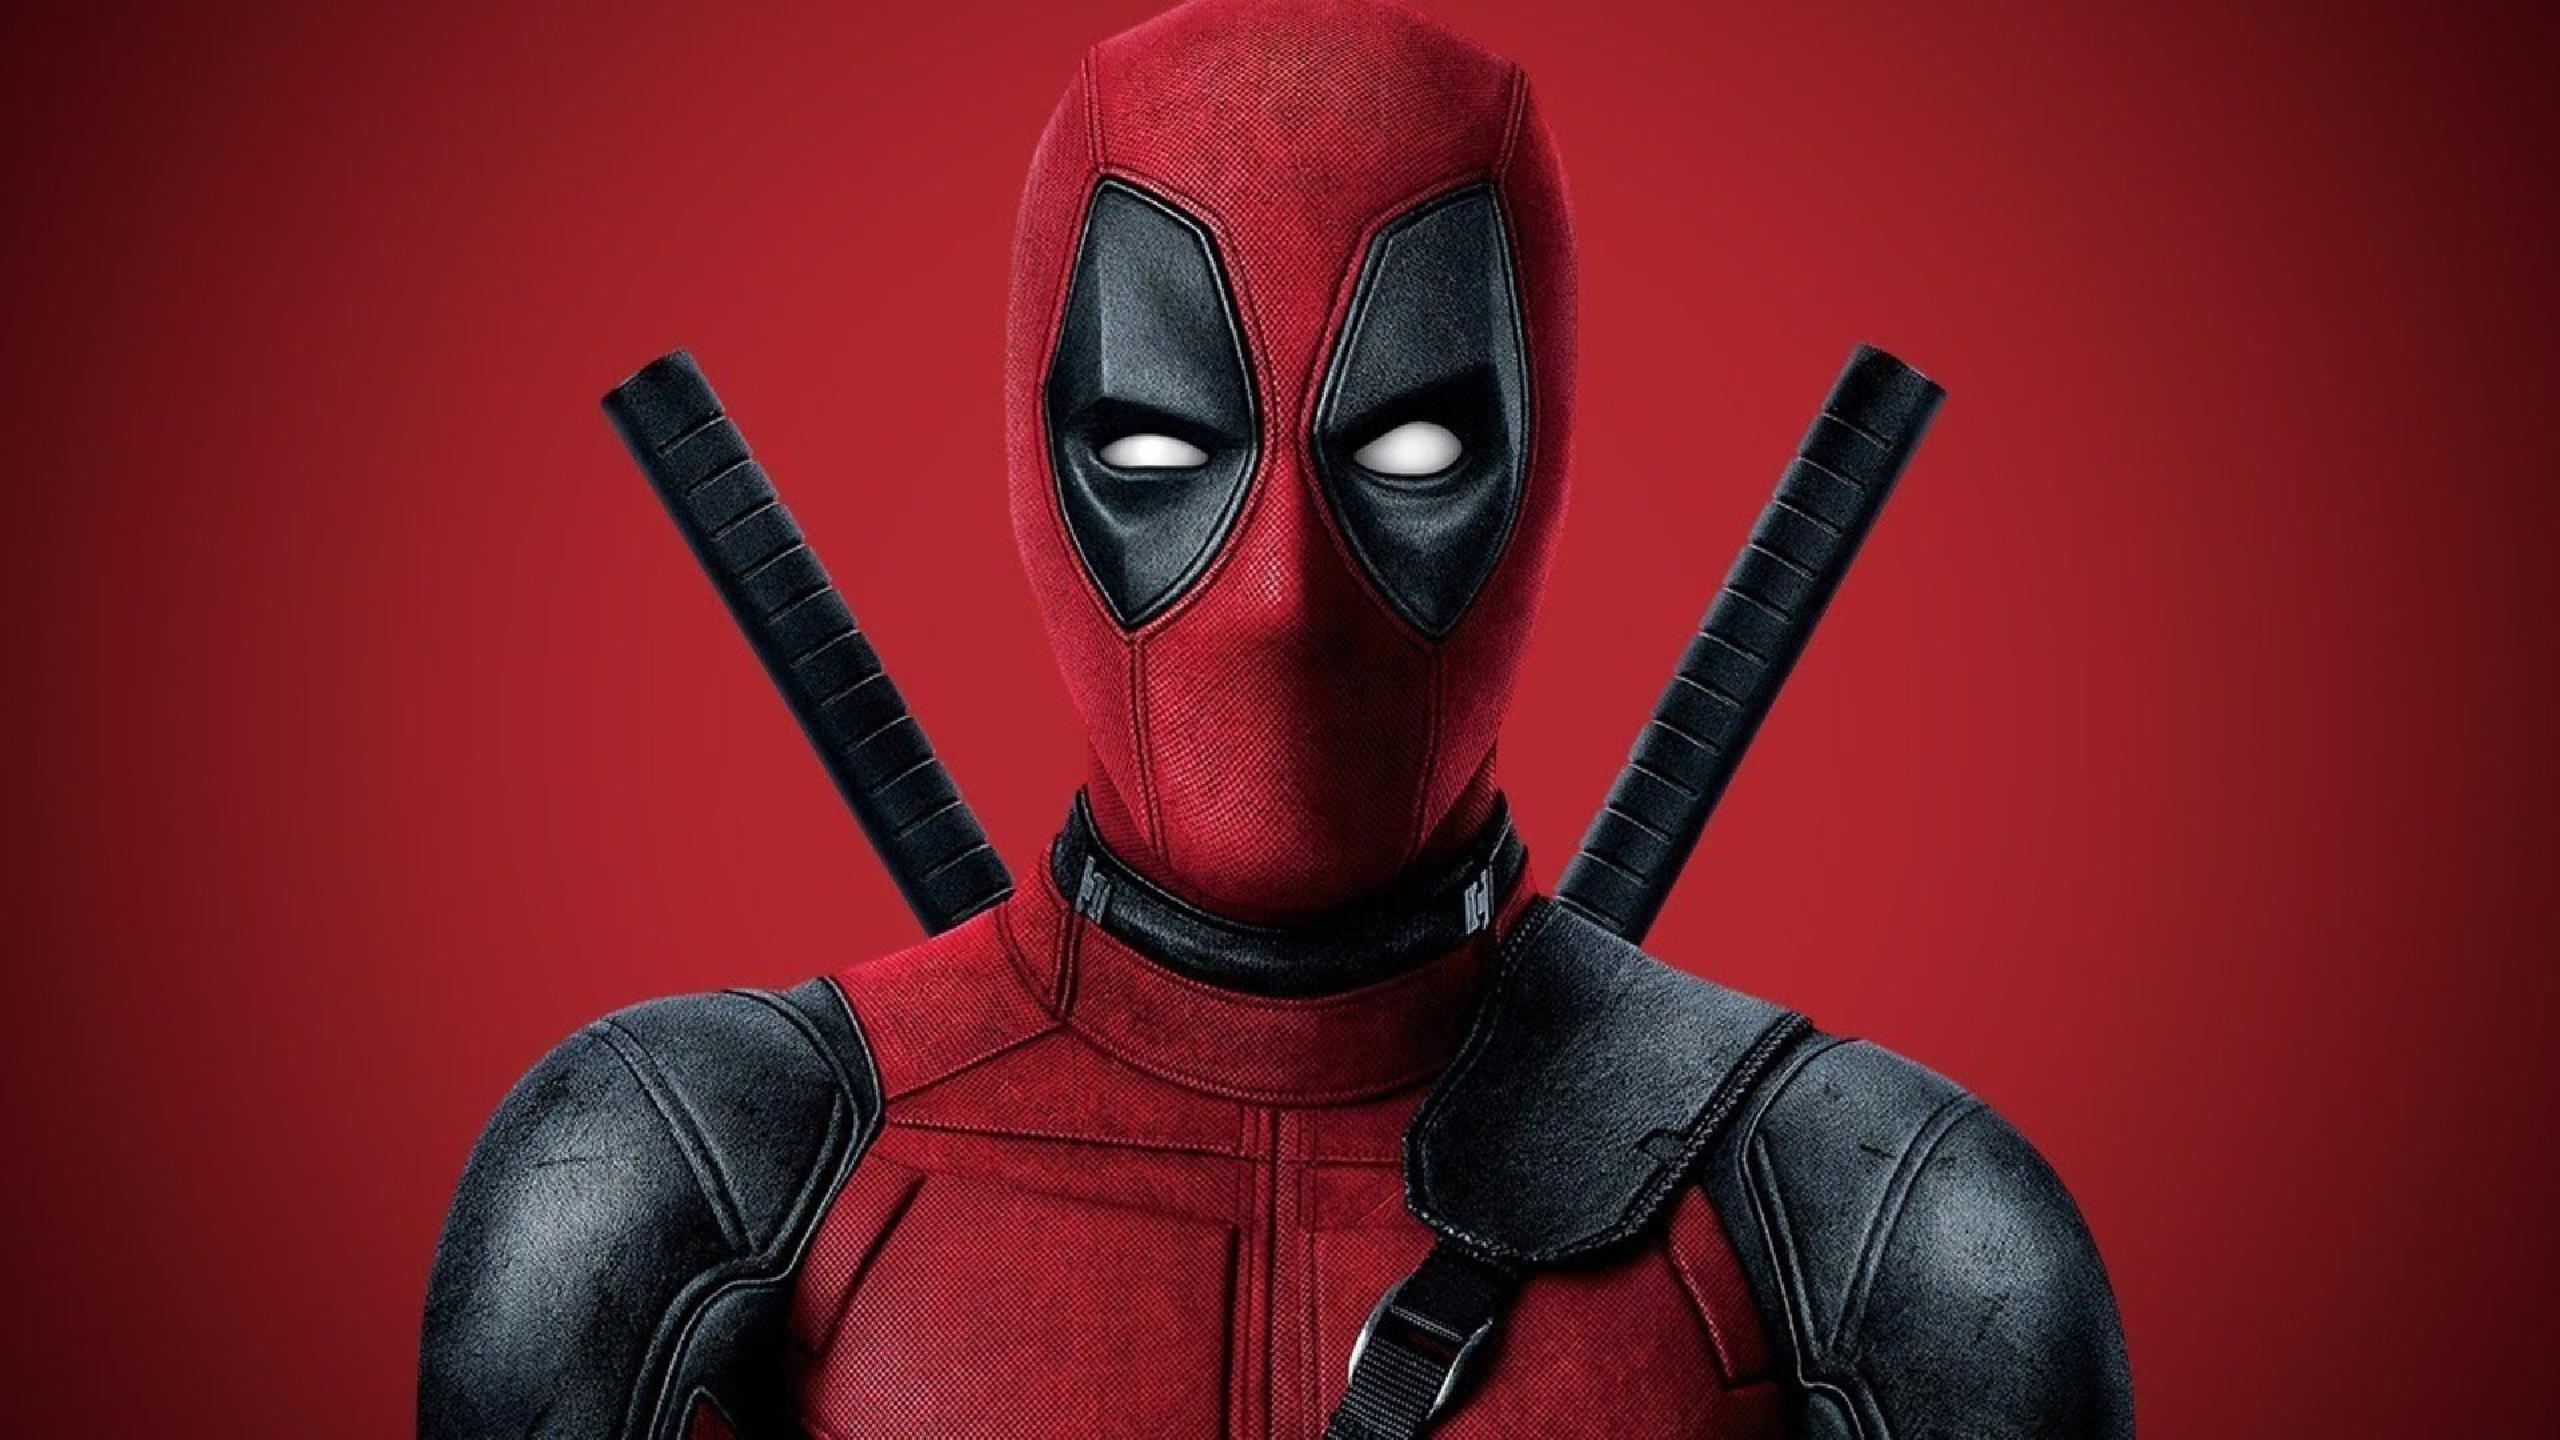 Fondo de pantalla de Deadpool Imágenes